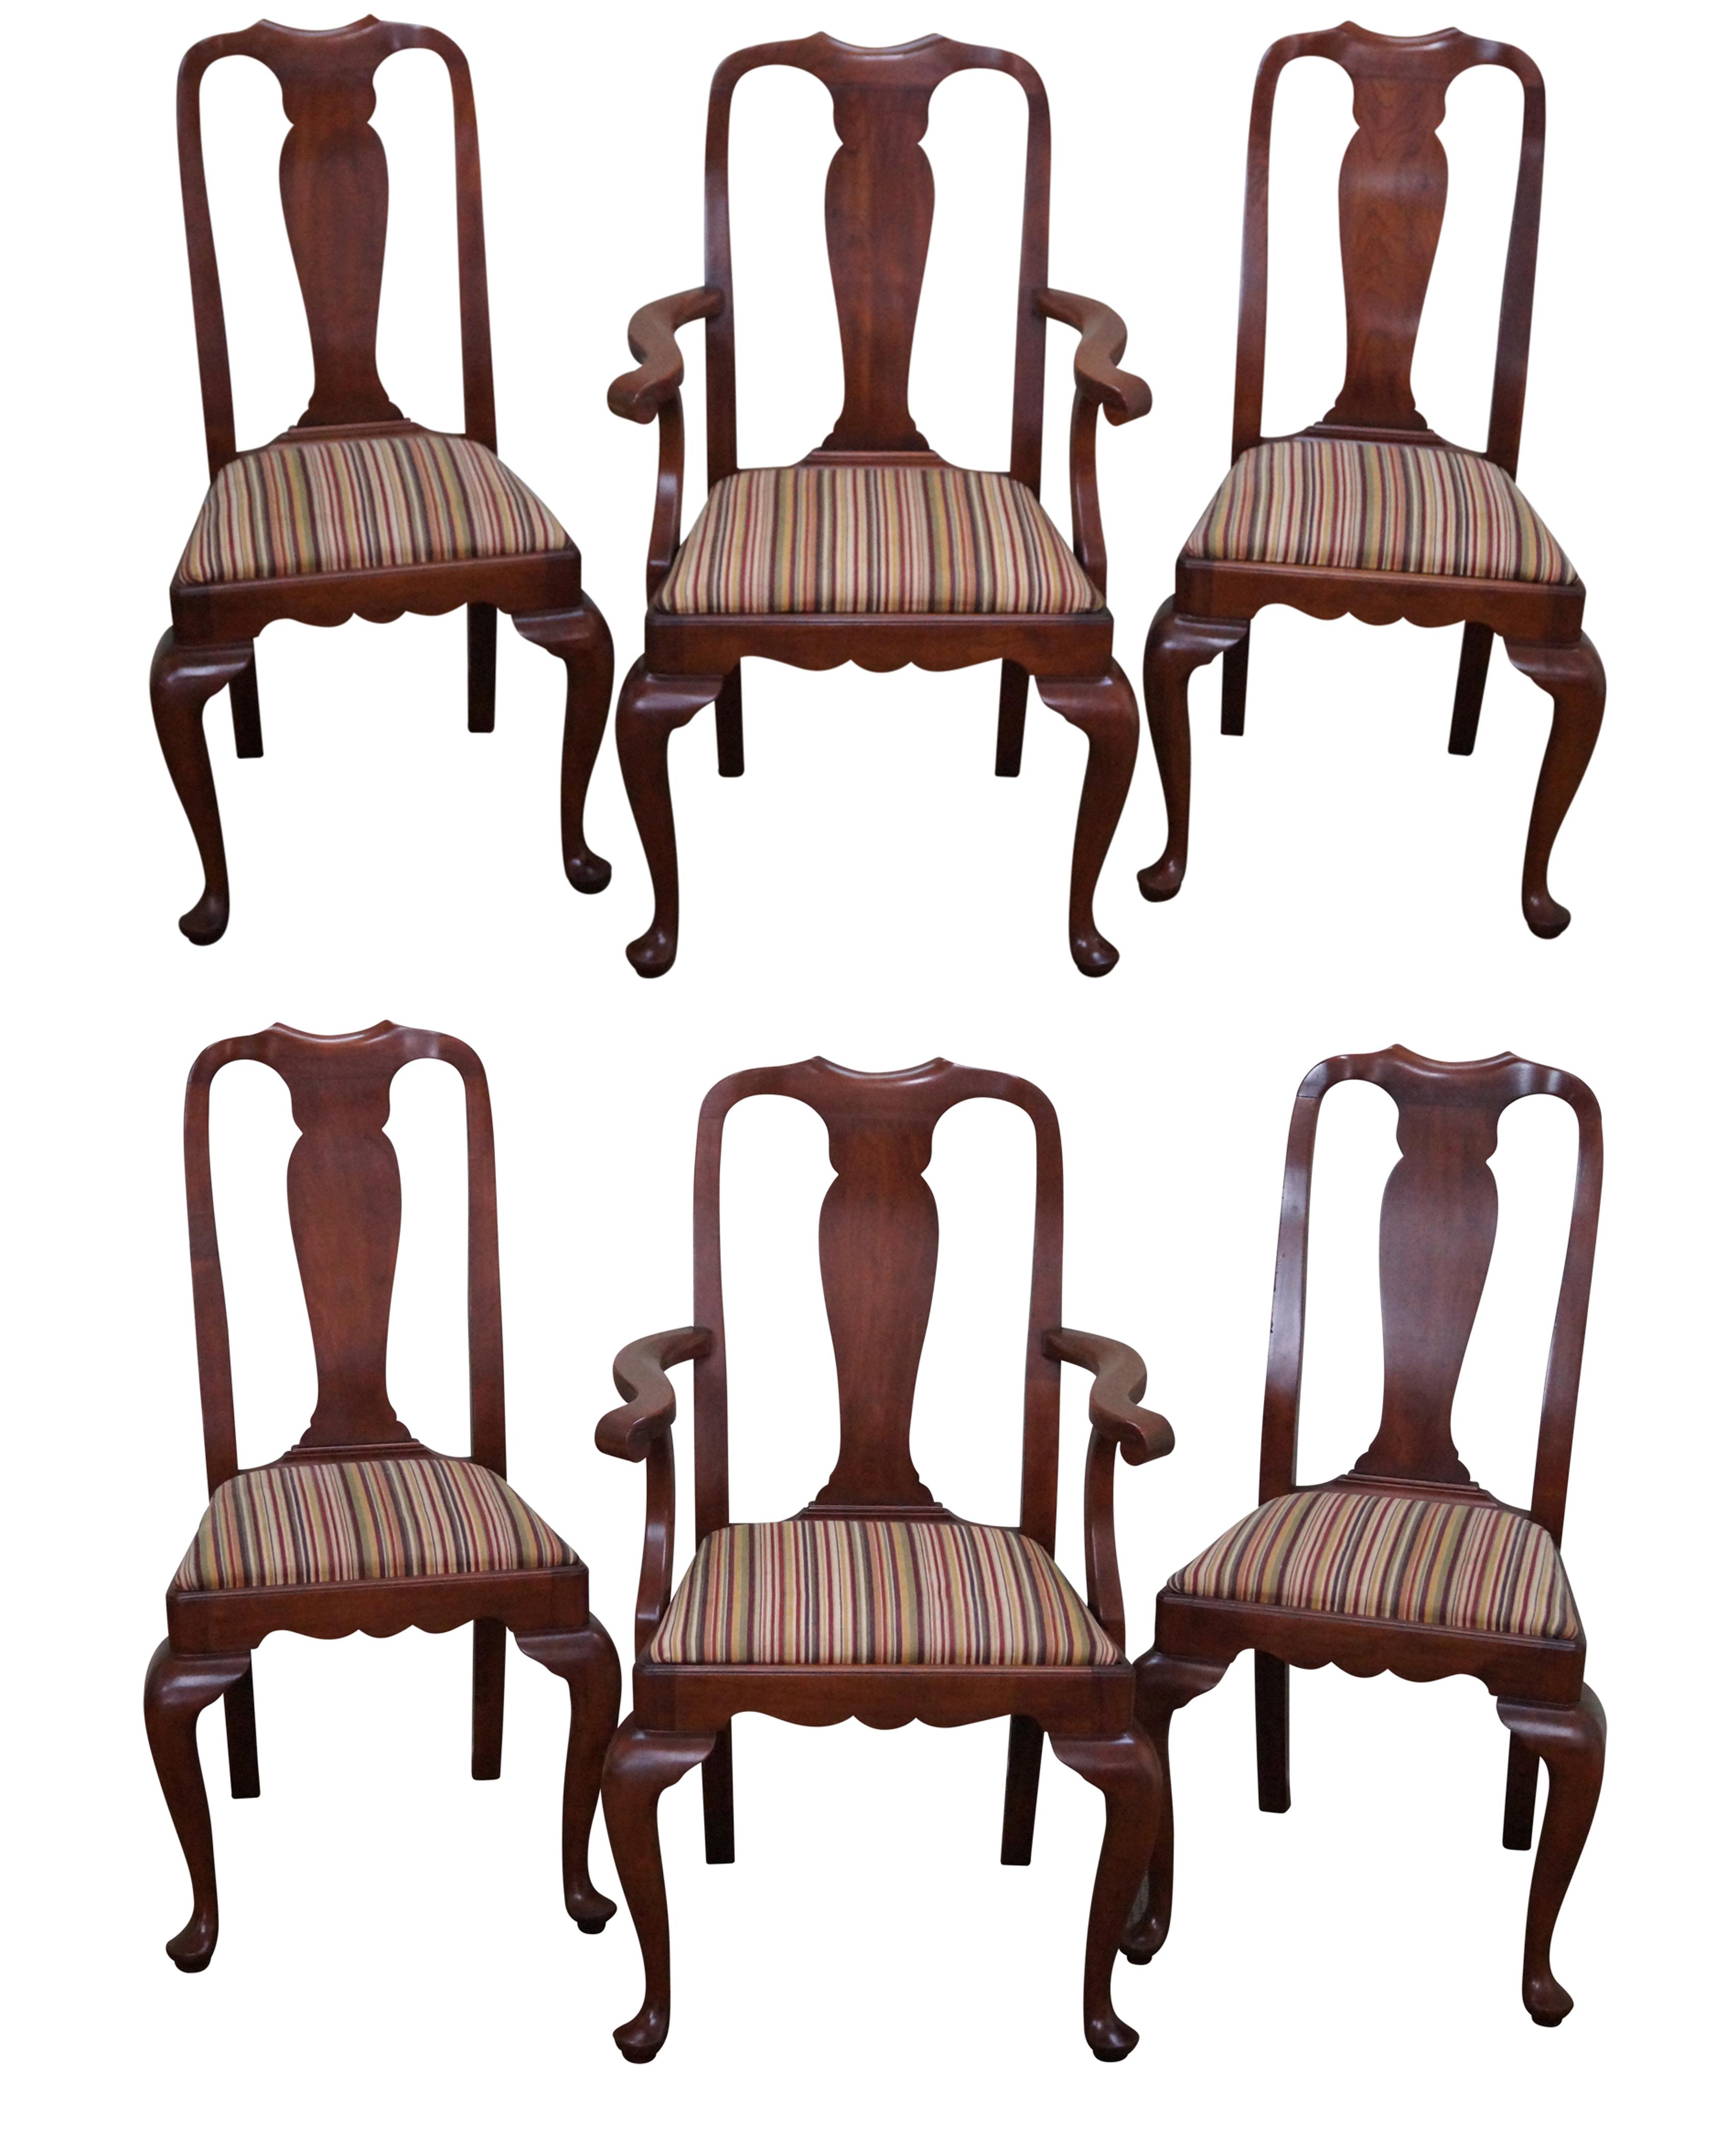 Henkel Harris Cherry Queen Anne Dining Chairs - 6